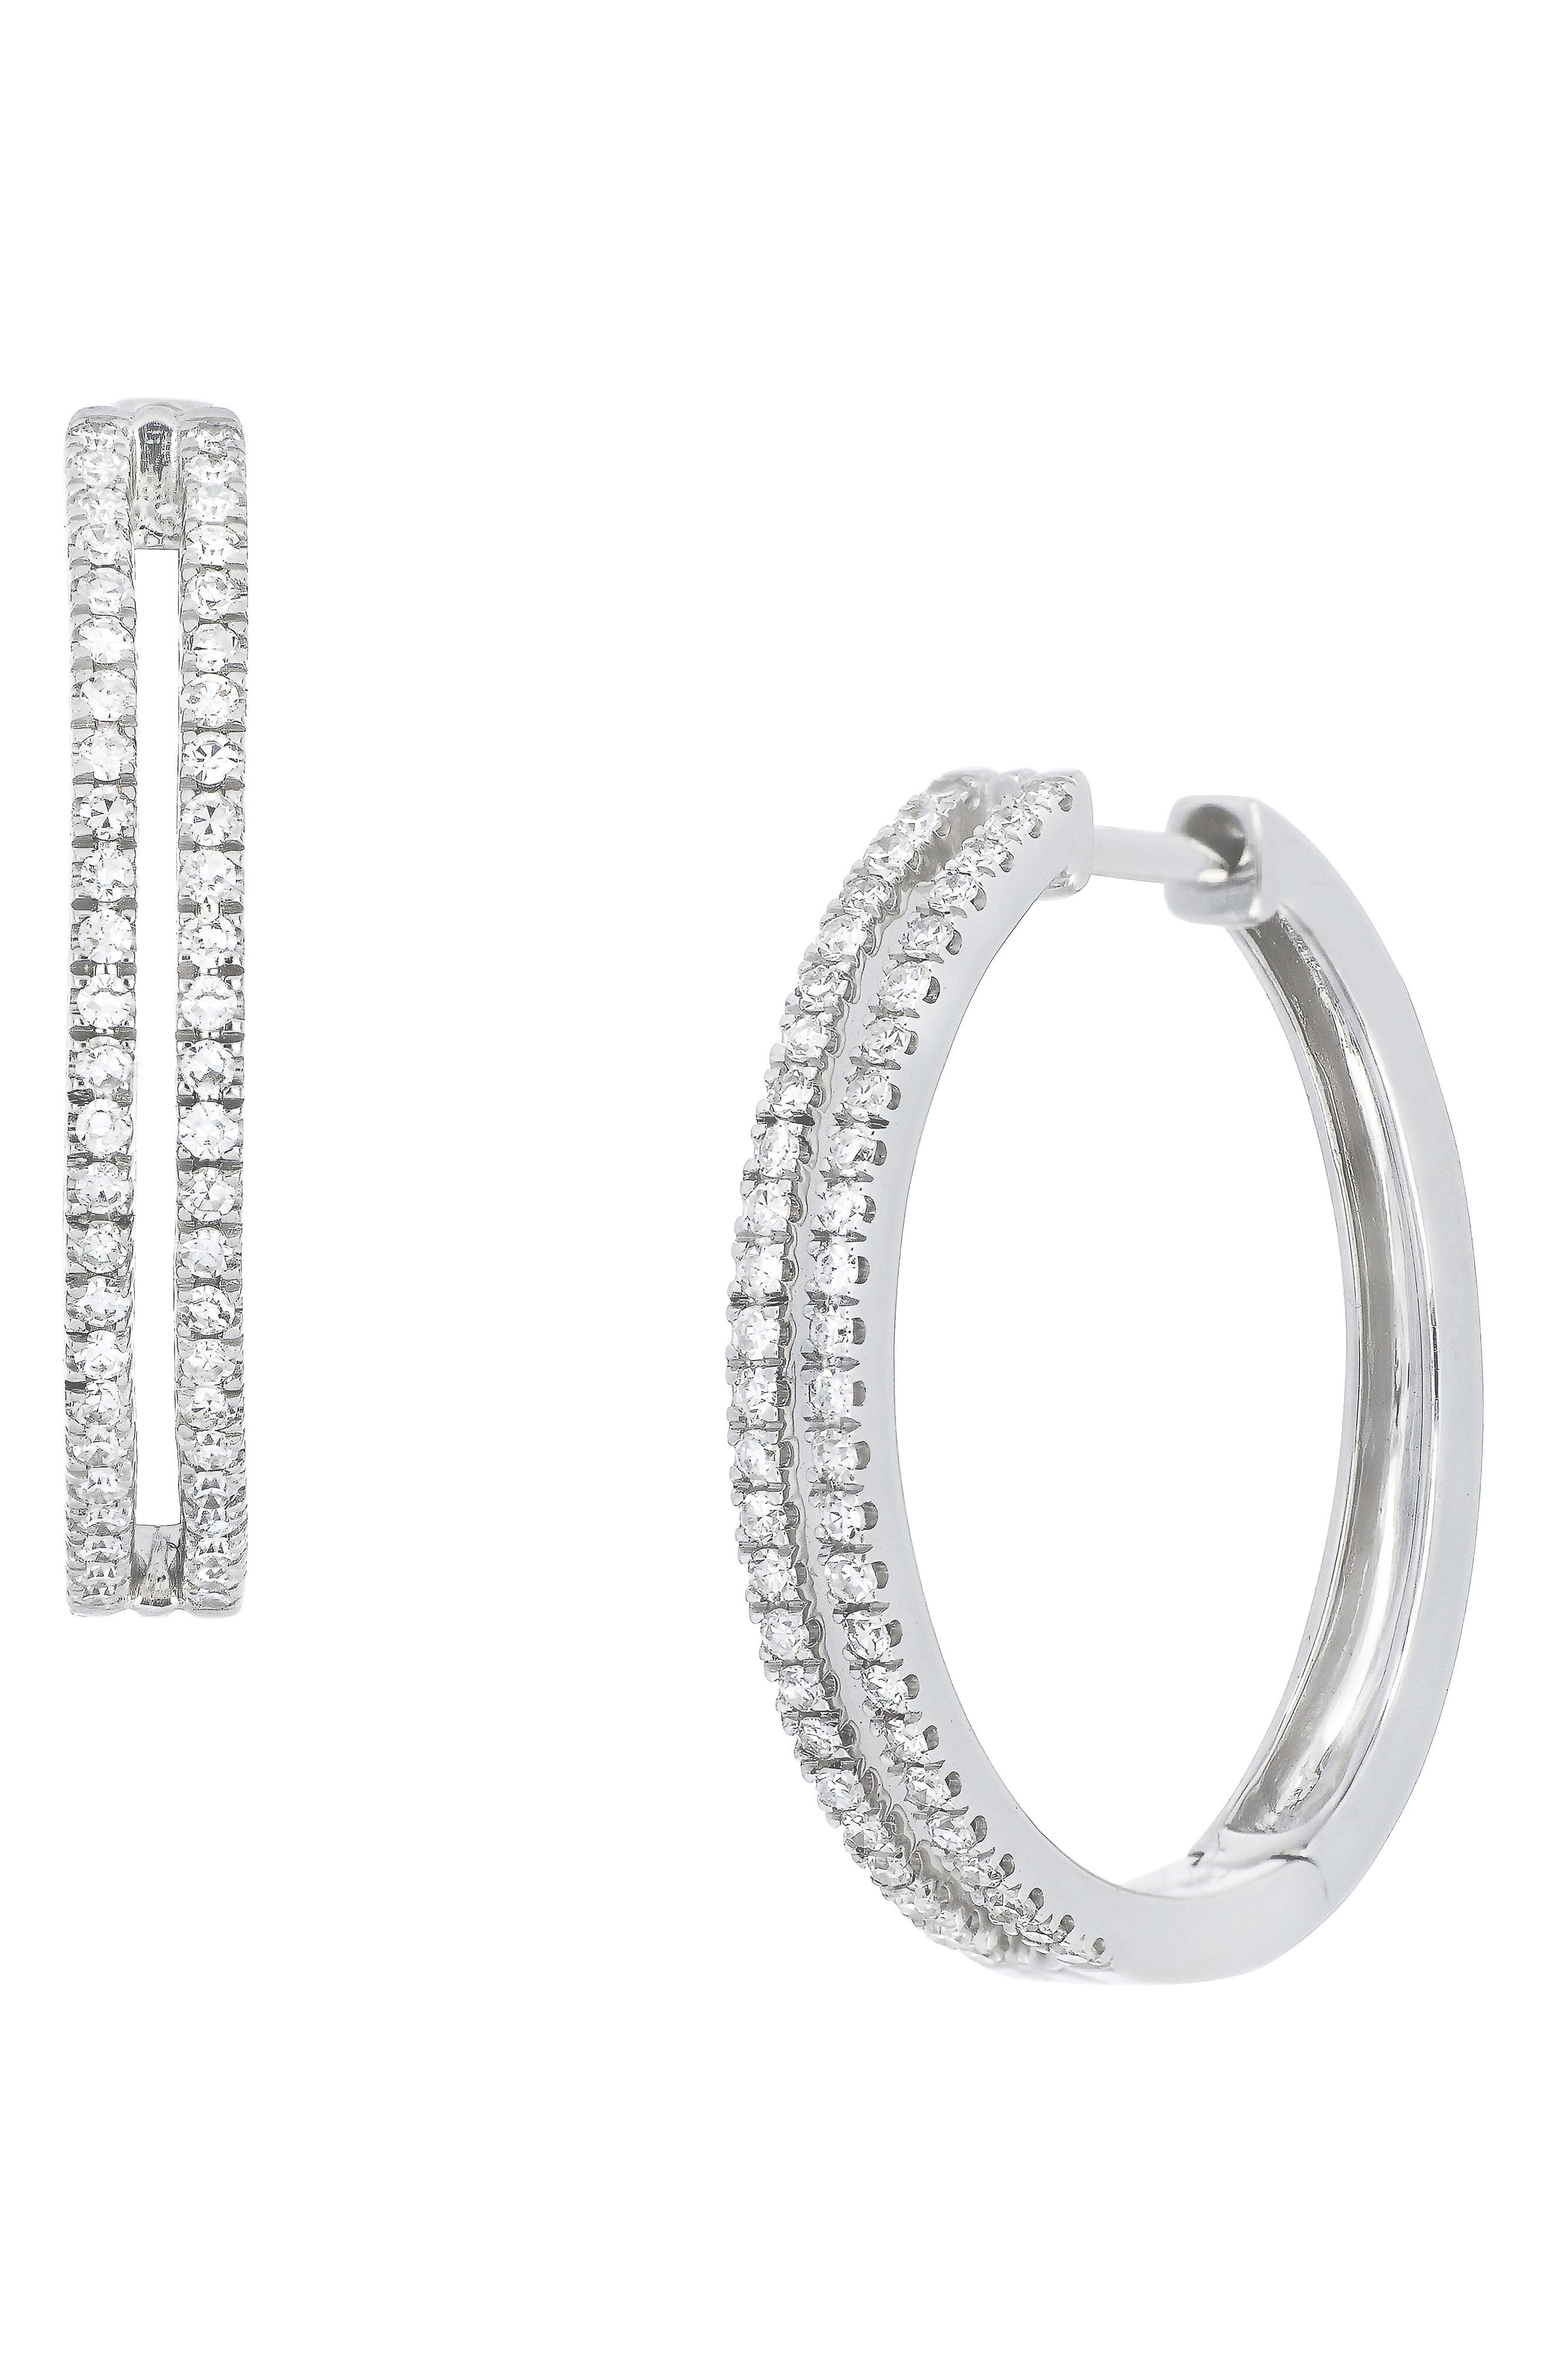 Carrière Double Row Diamond Hoop Earrings,                             Main thumbnail 1, color,                             Sterling Silver/ Diamond